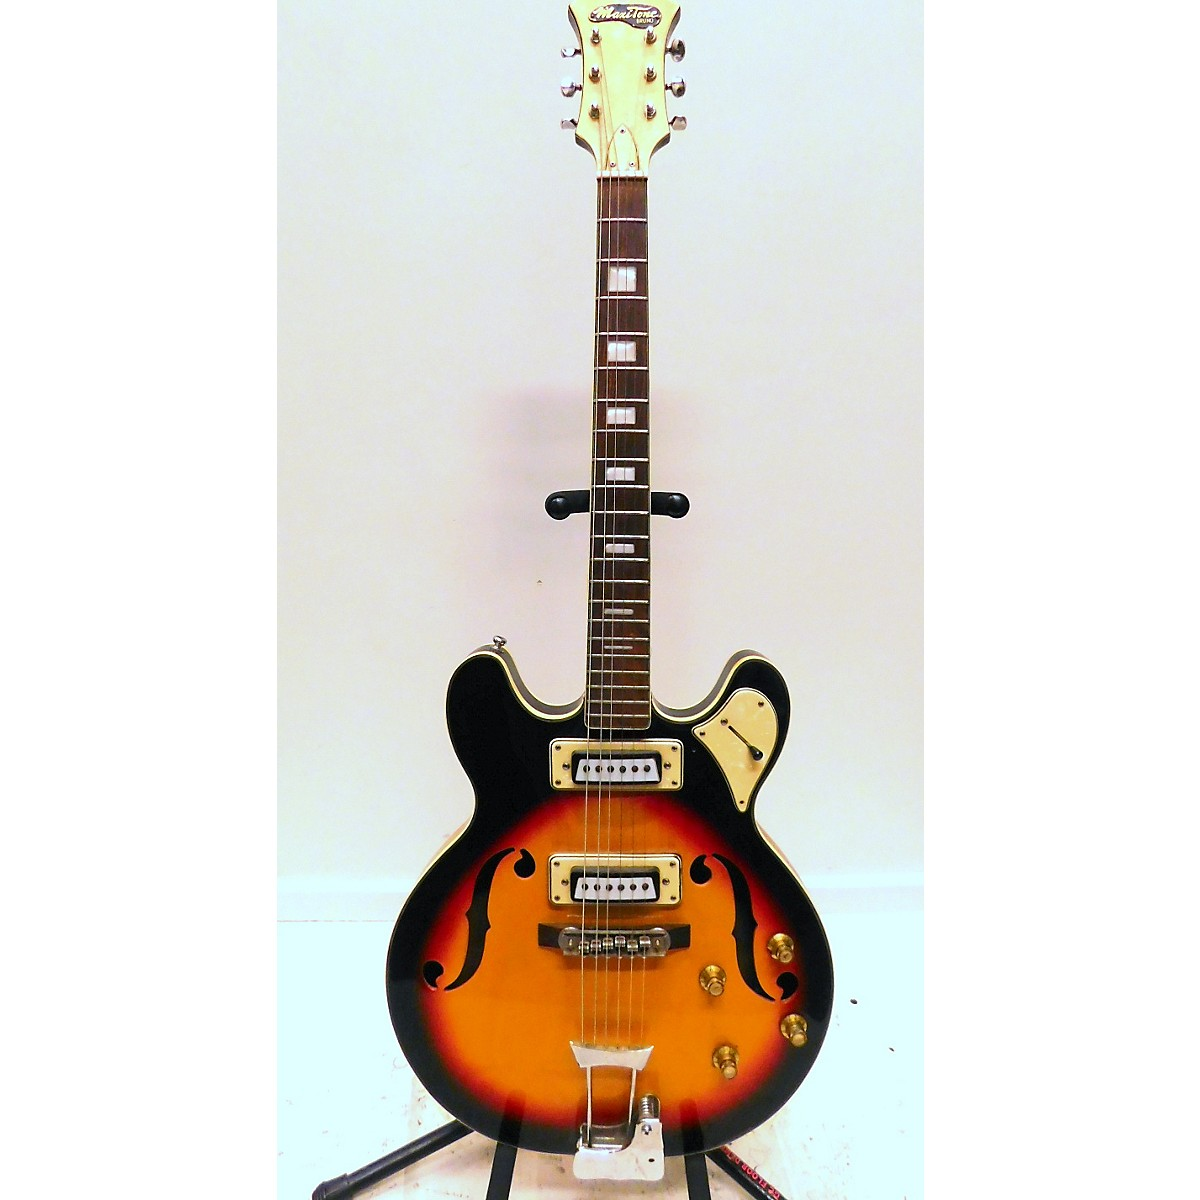 In Store Vintage Vintage 1960s Maxitone Bruno Vintage Sunburst Hollow Body Electric Guitar